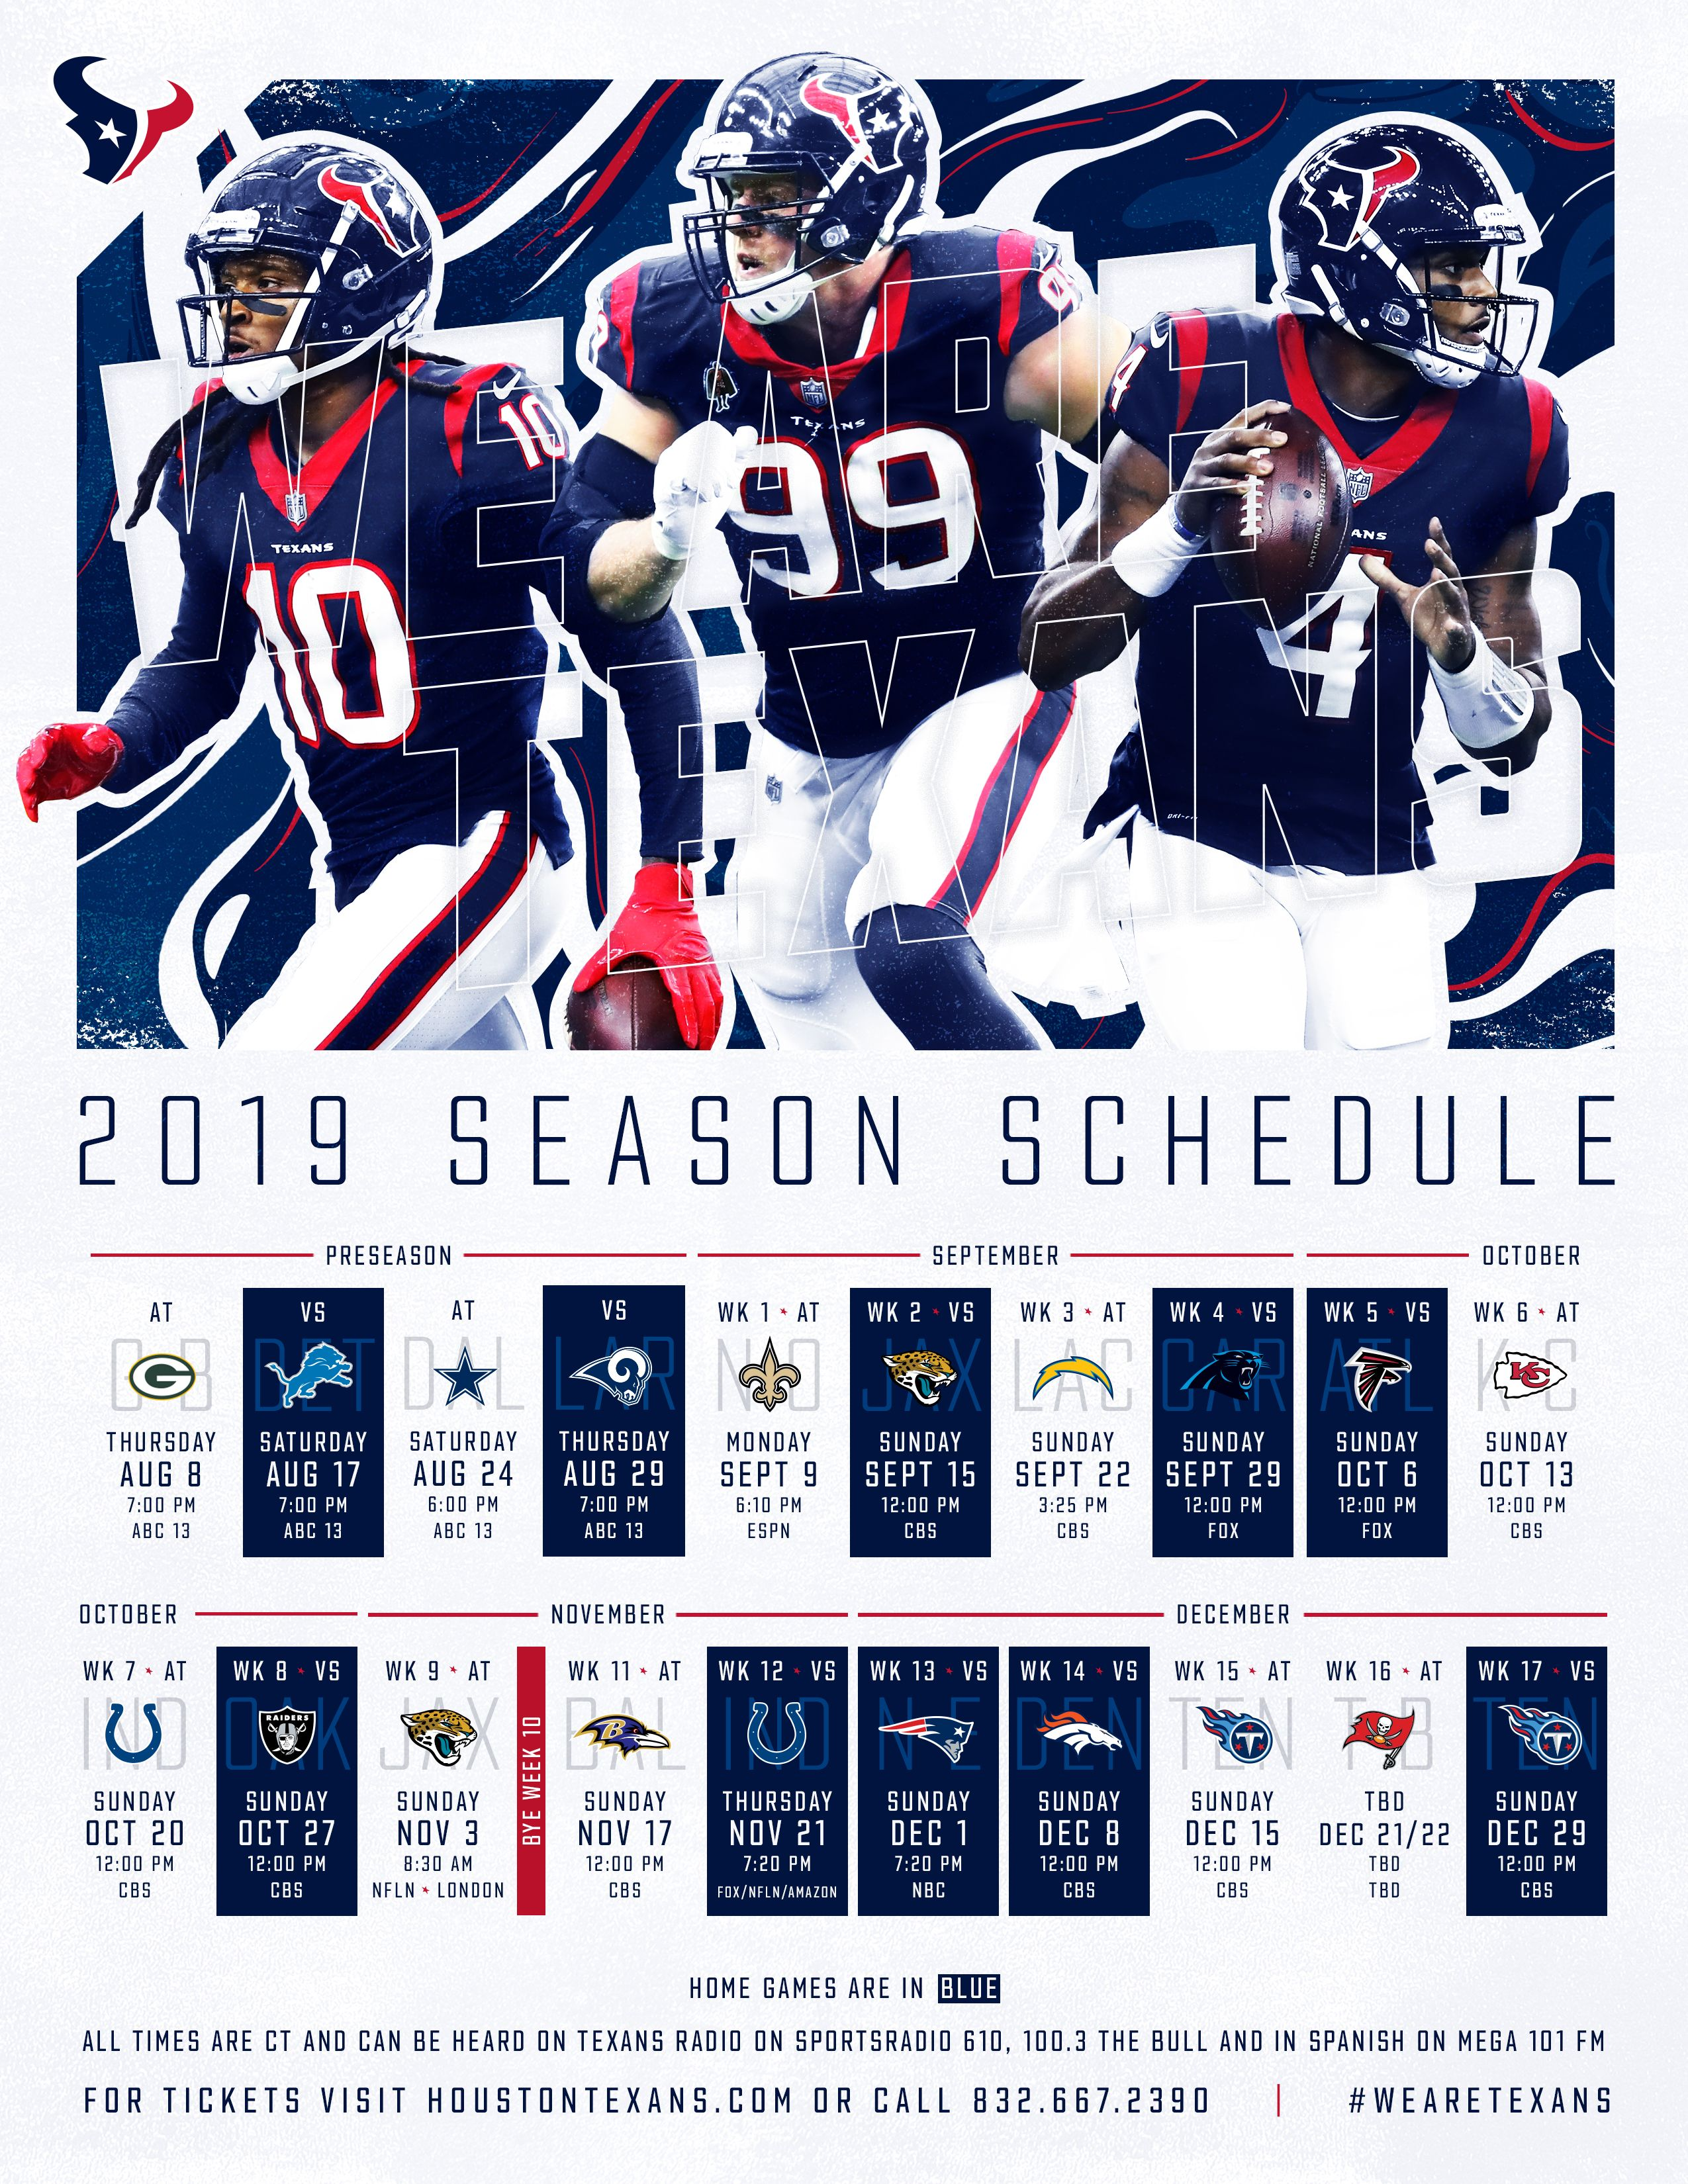 Pin by NFL Football on CHC/Rocket Nfl season schedule